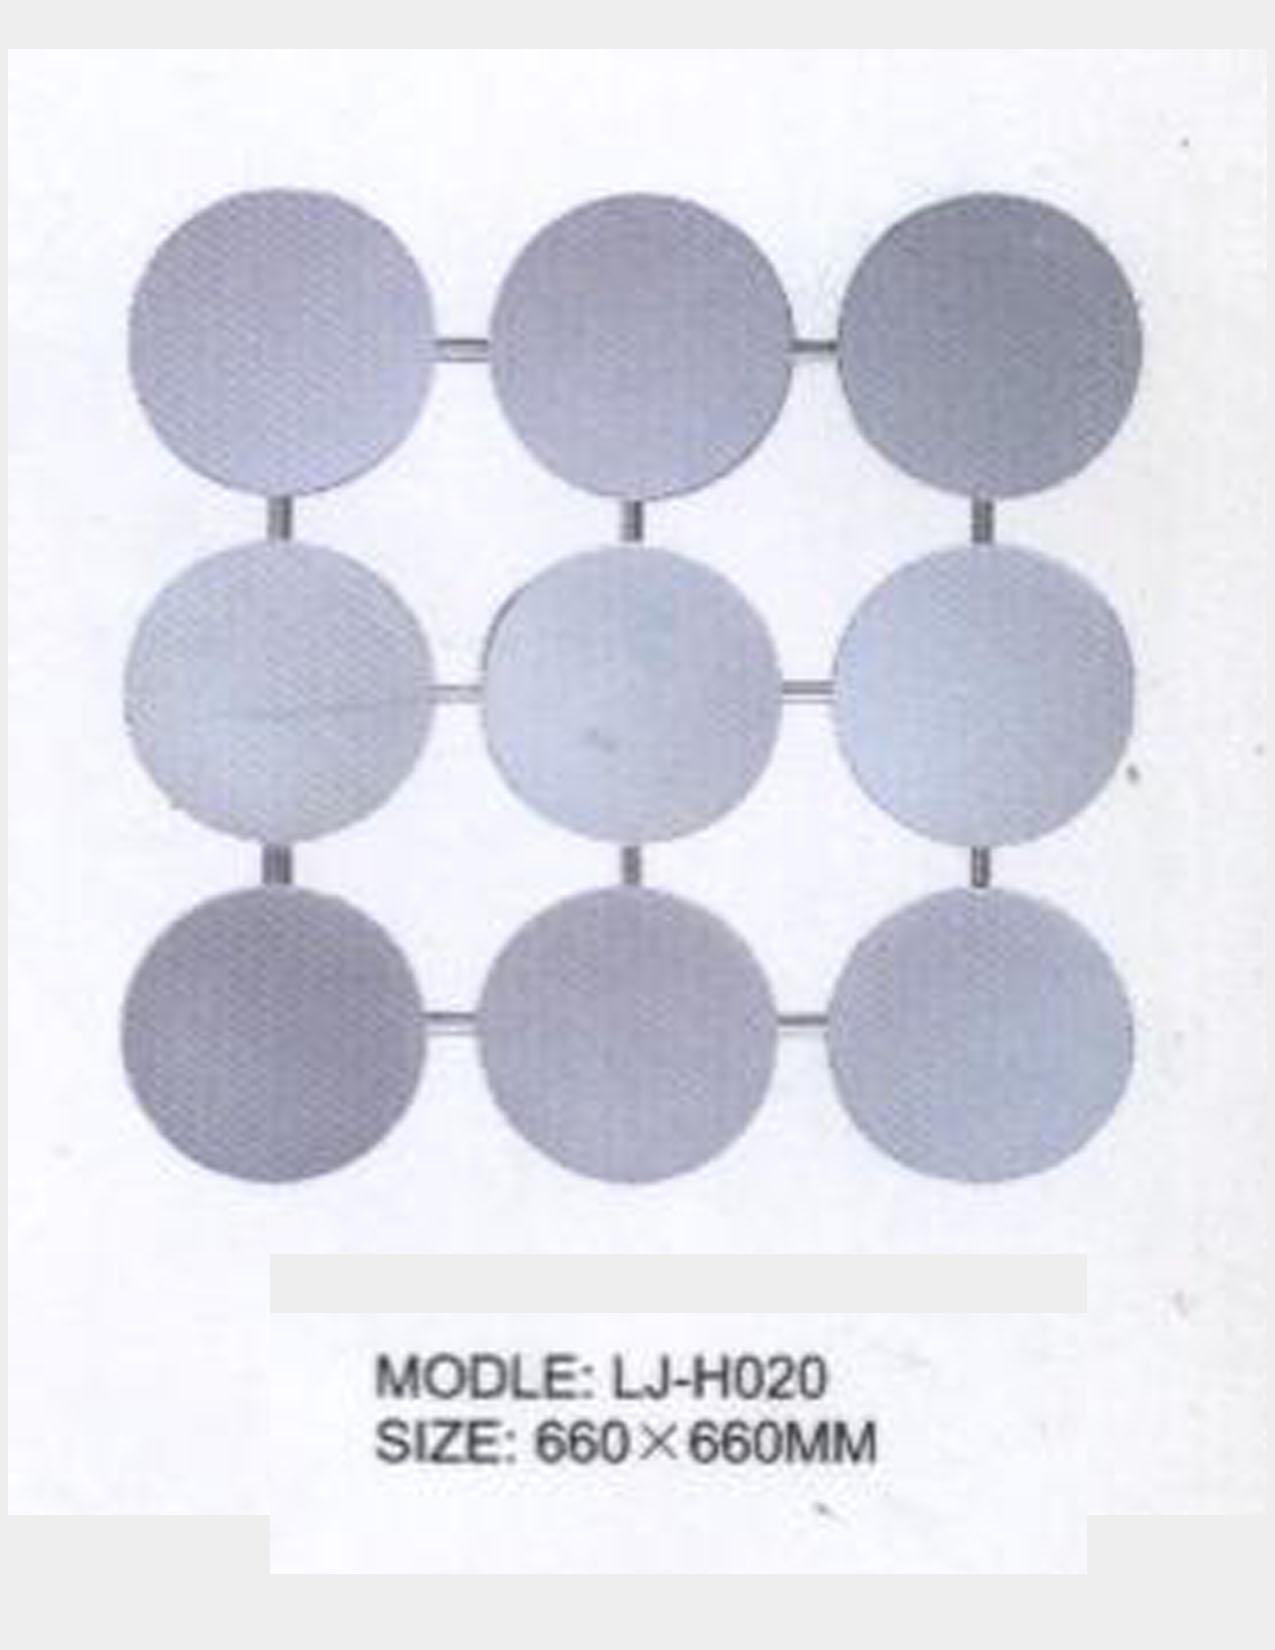 See larger image: builder mirror,LJ-H020-Chris. Add to My Favorites